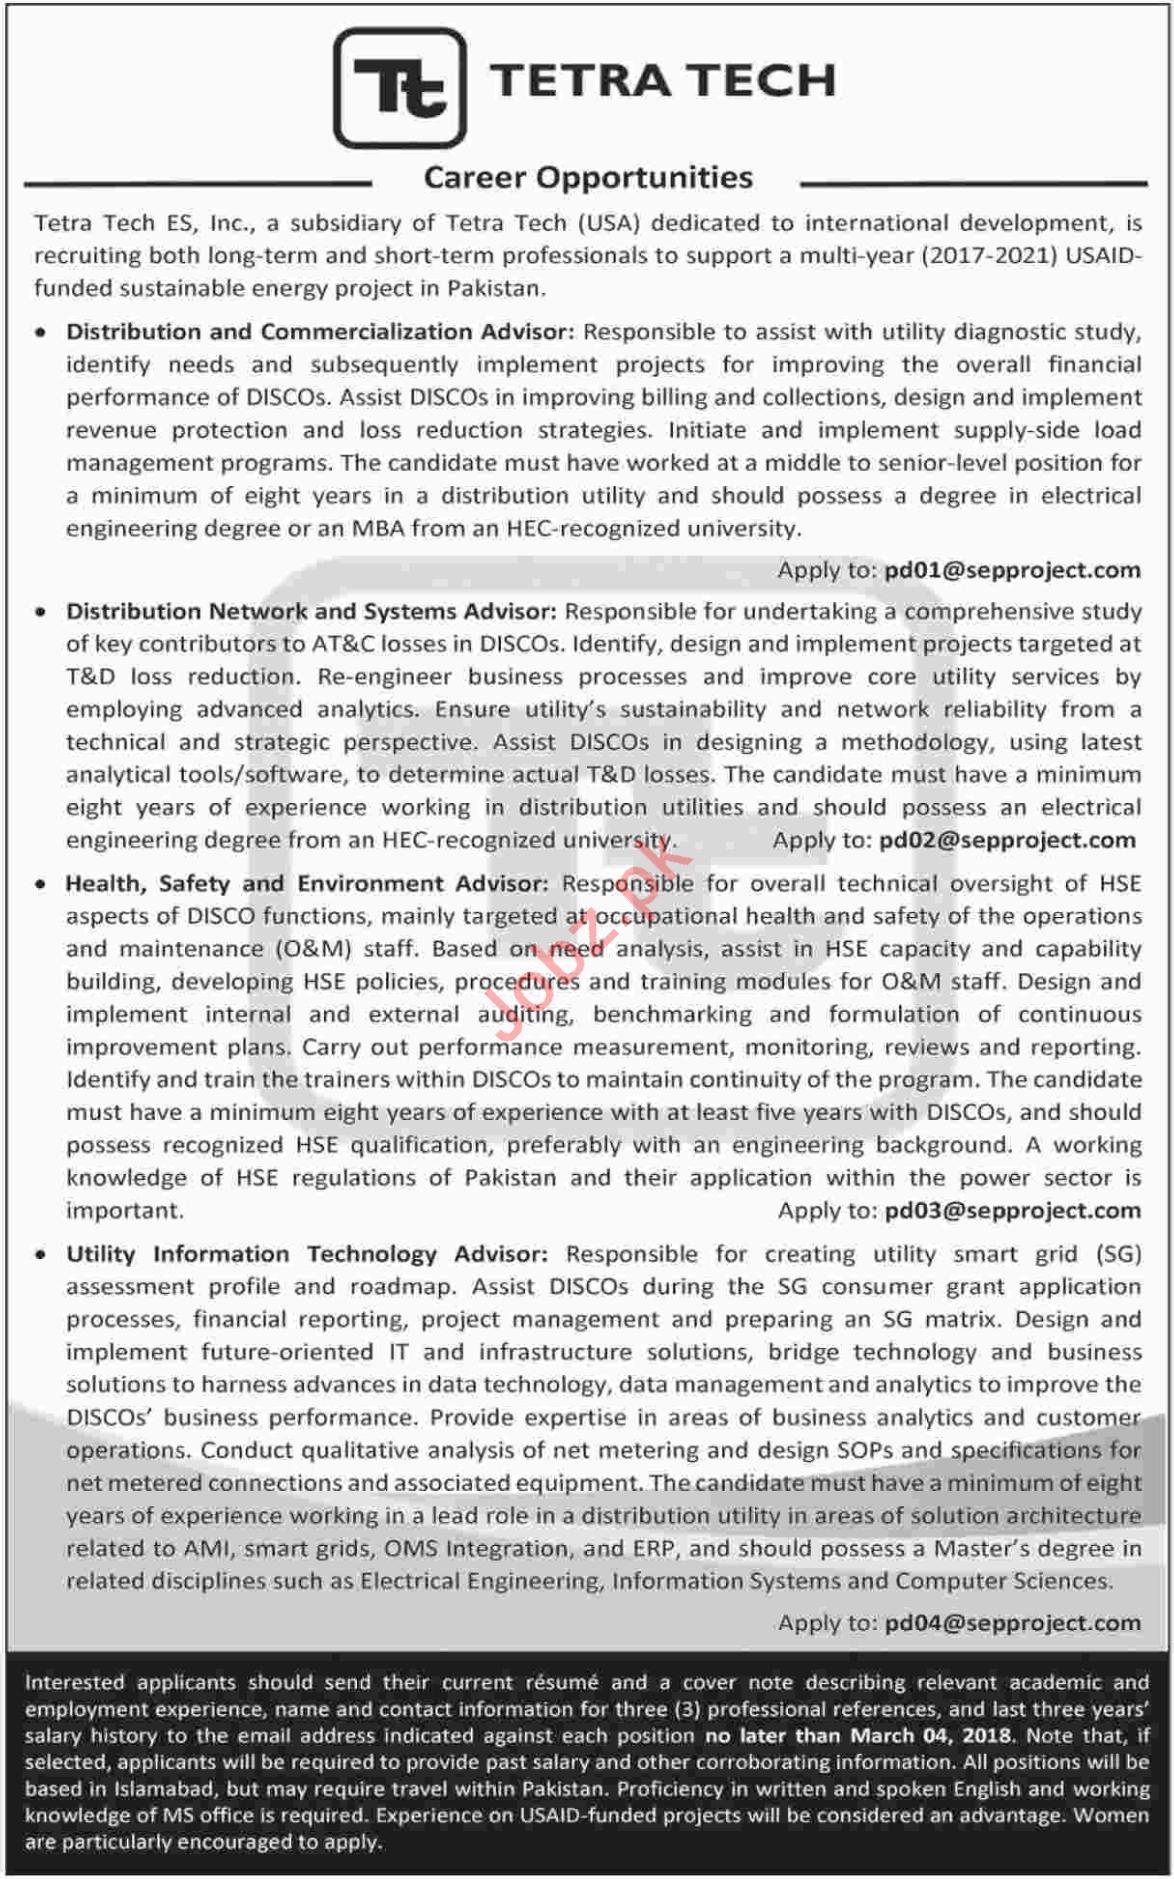 Tetra Tech Karachi Jobs 2018